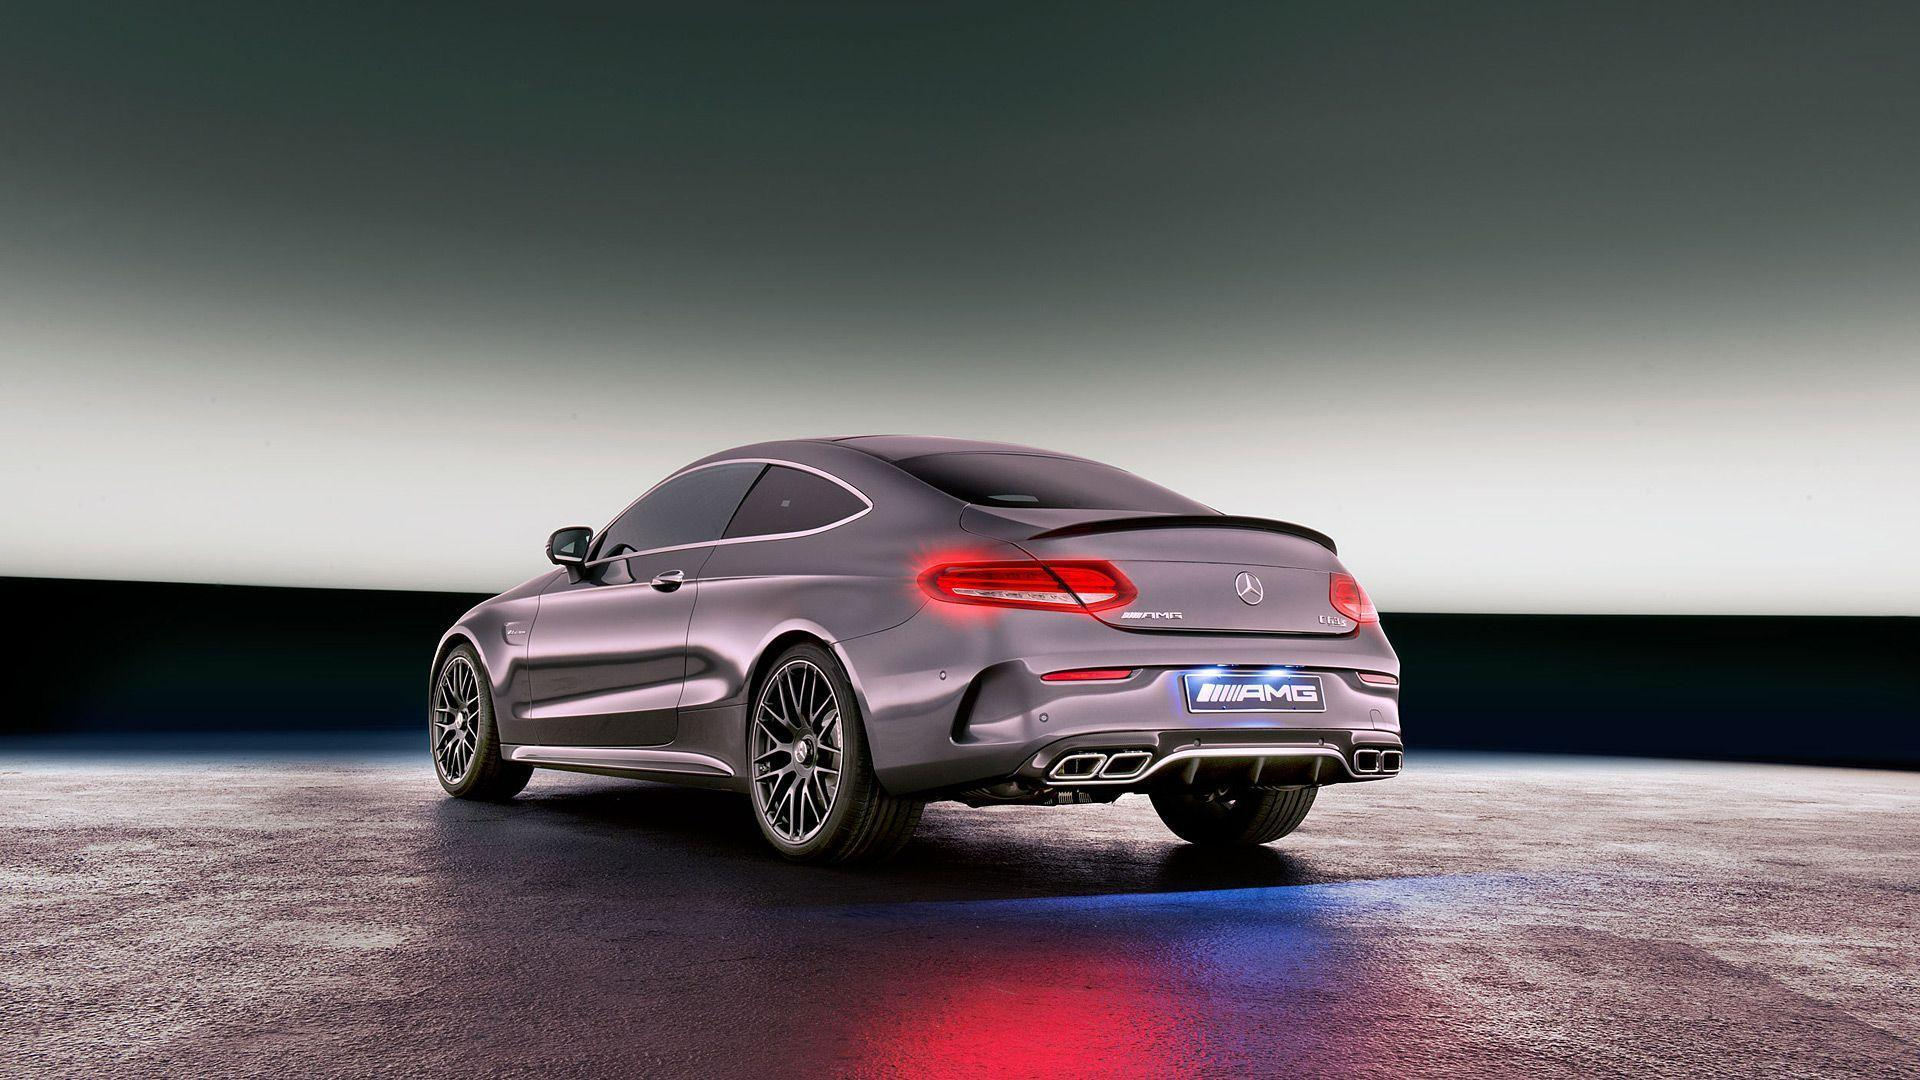 Mercedes Benz 2017 Wallpapers 1920x1080